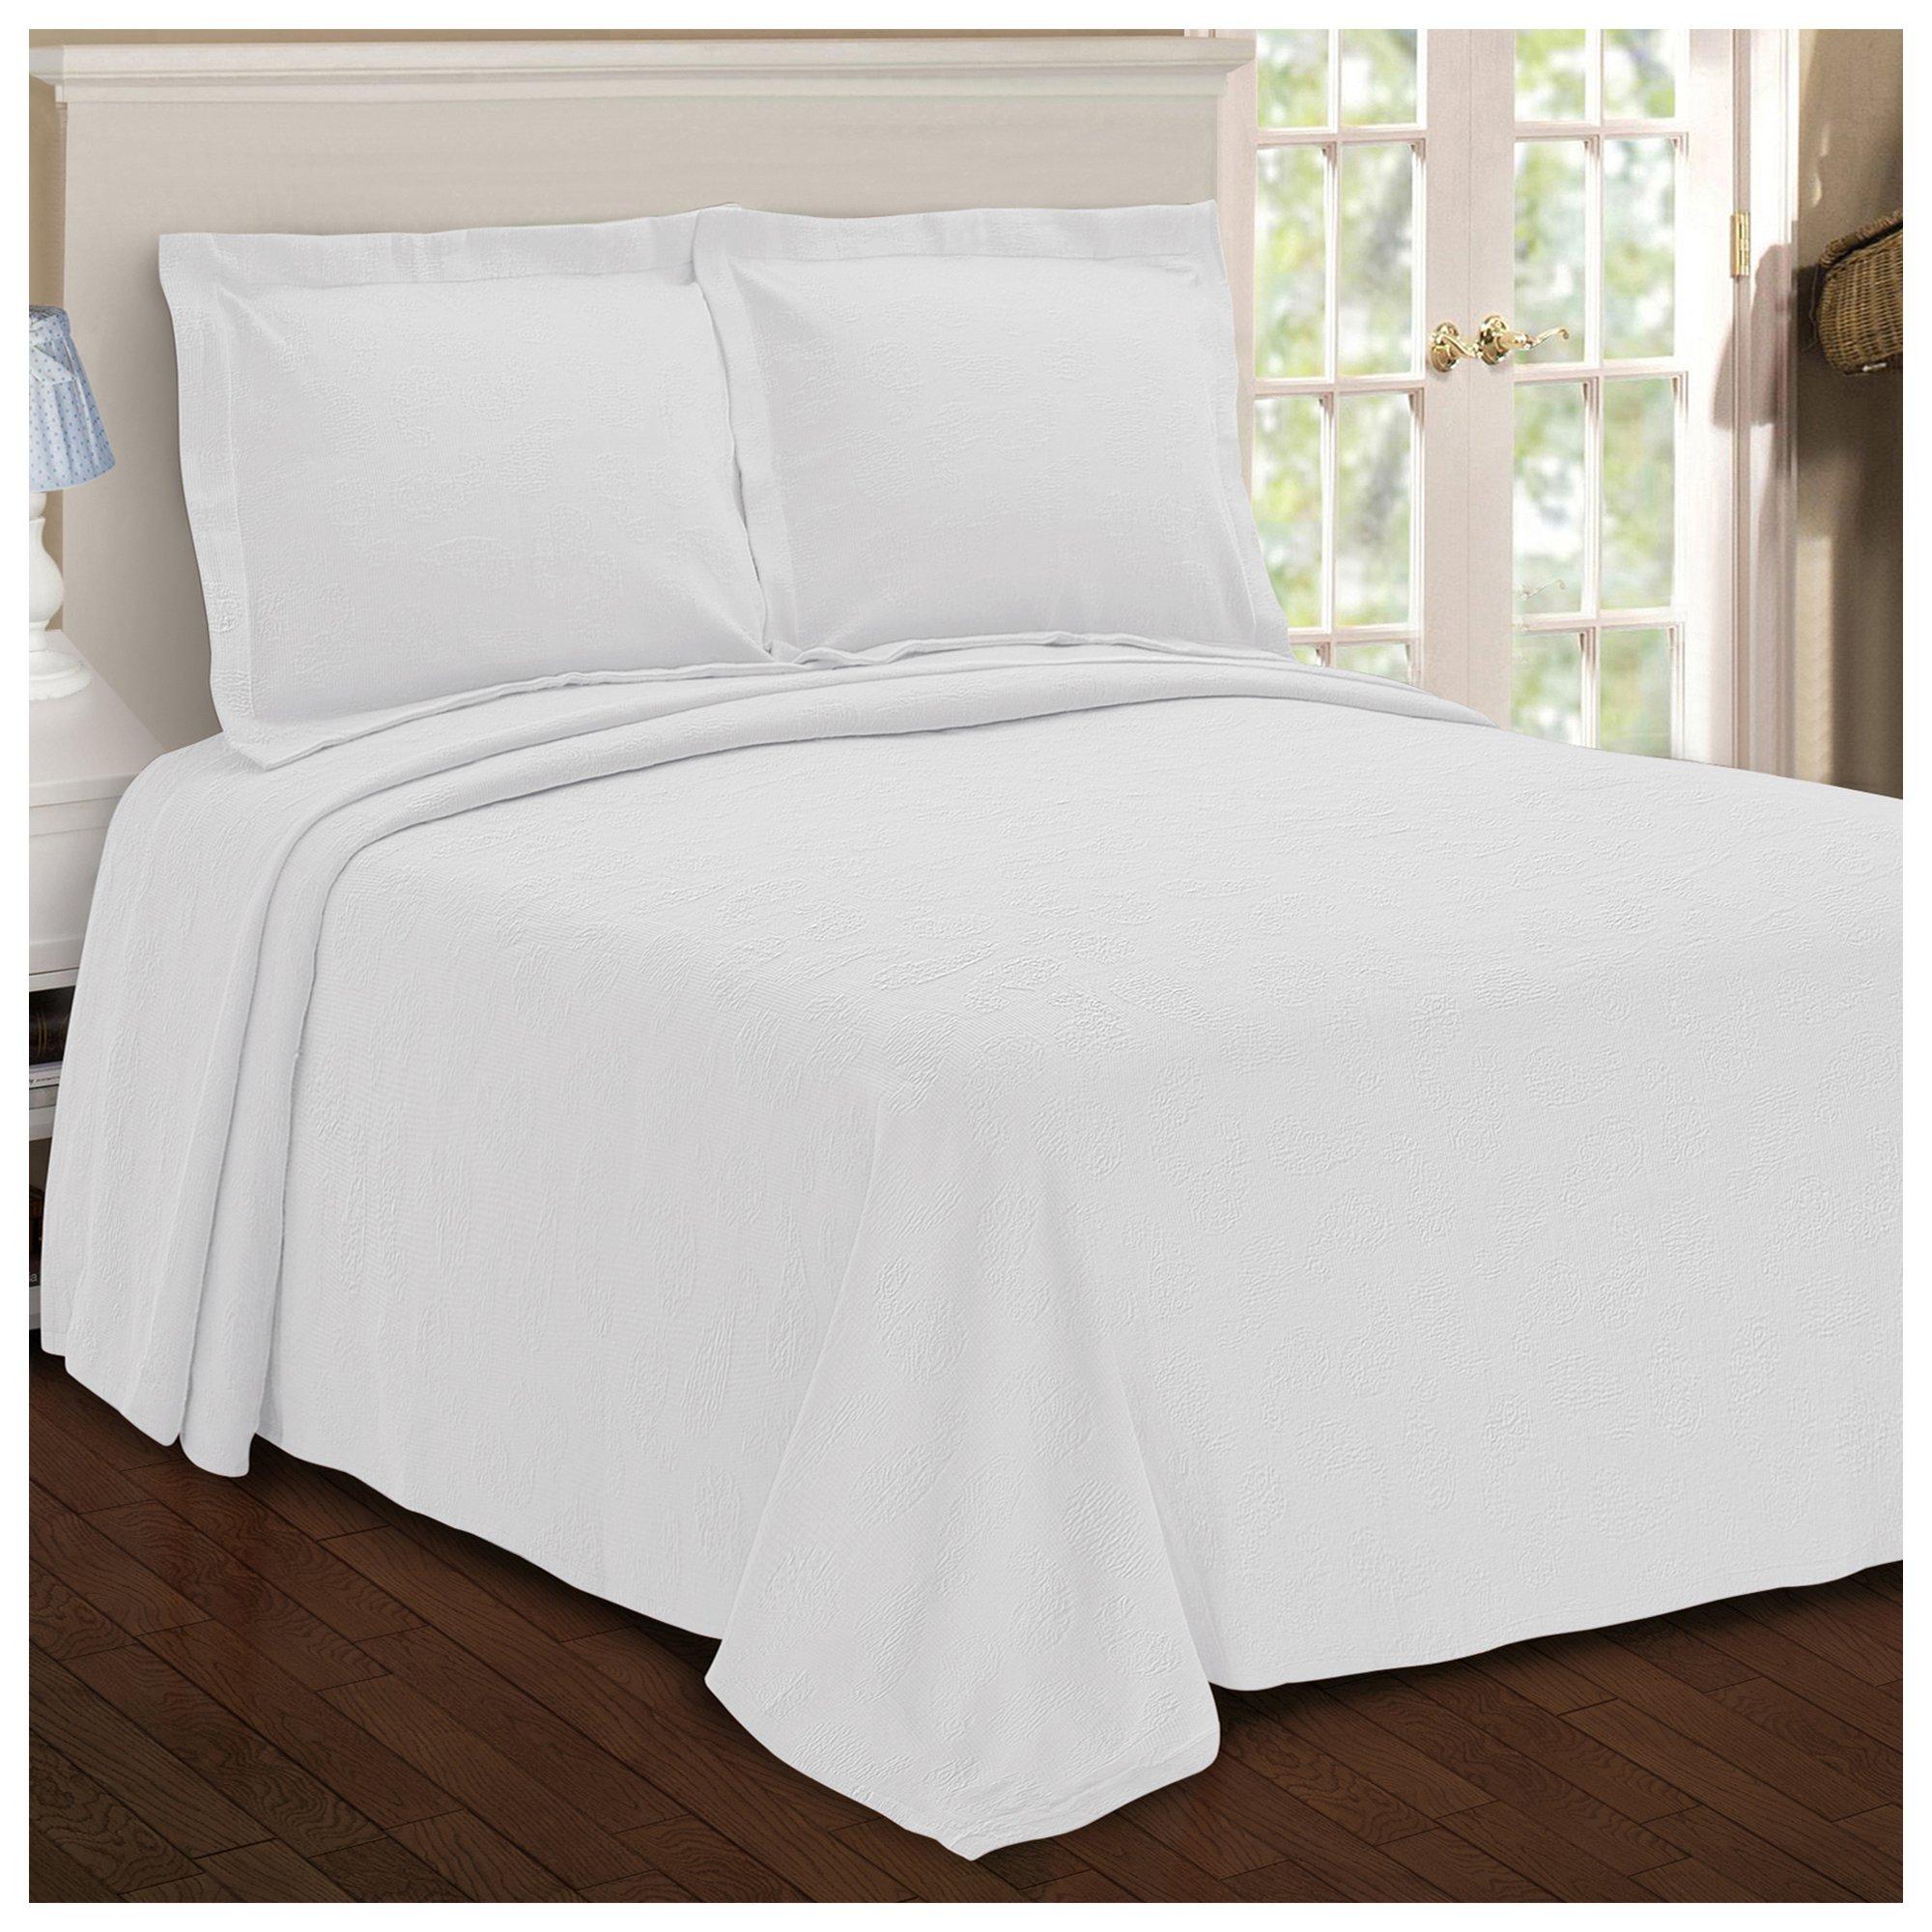 Superior Paisley Jacquard Matelassé 100% Premium Cotton Bedspread with Matching Shams, King, White